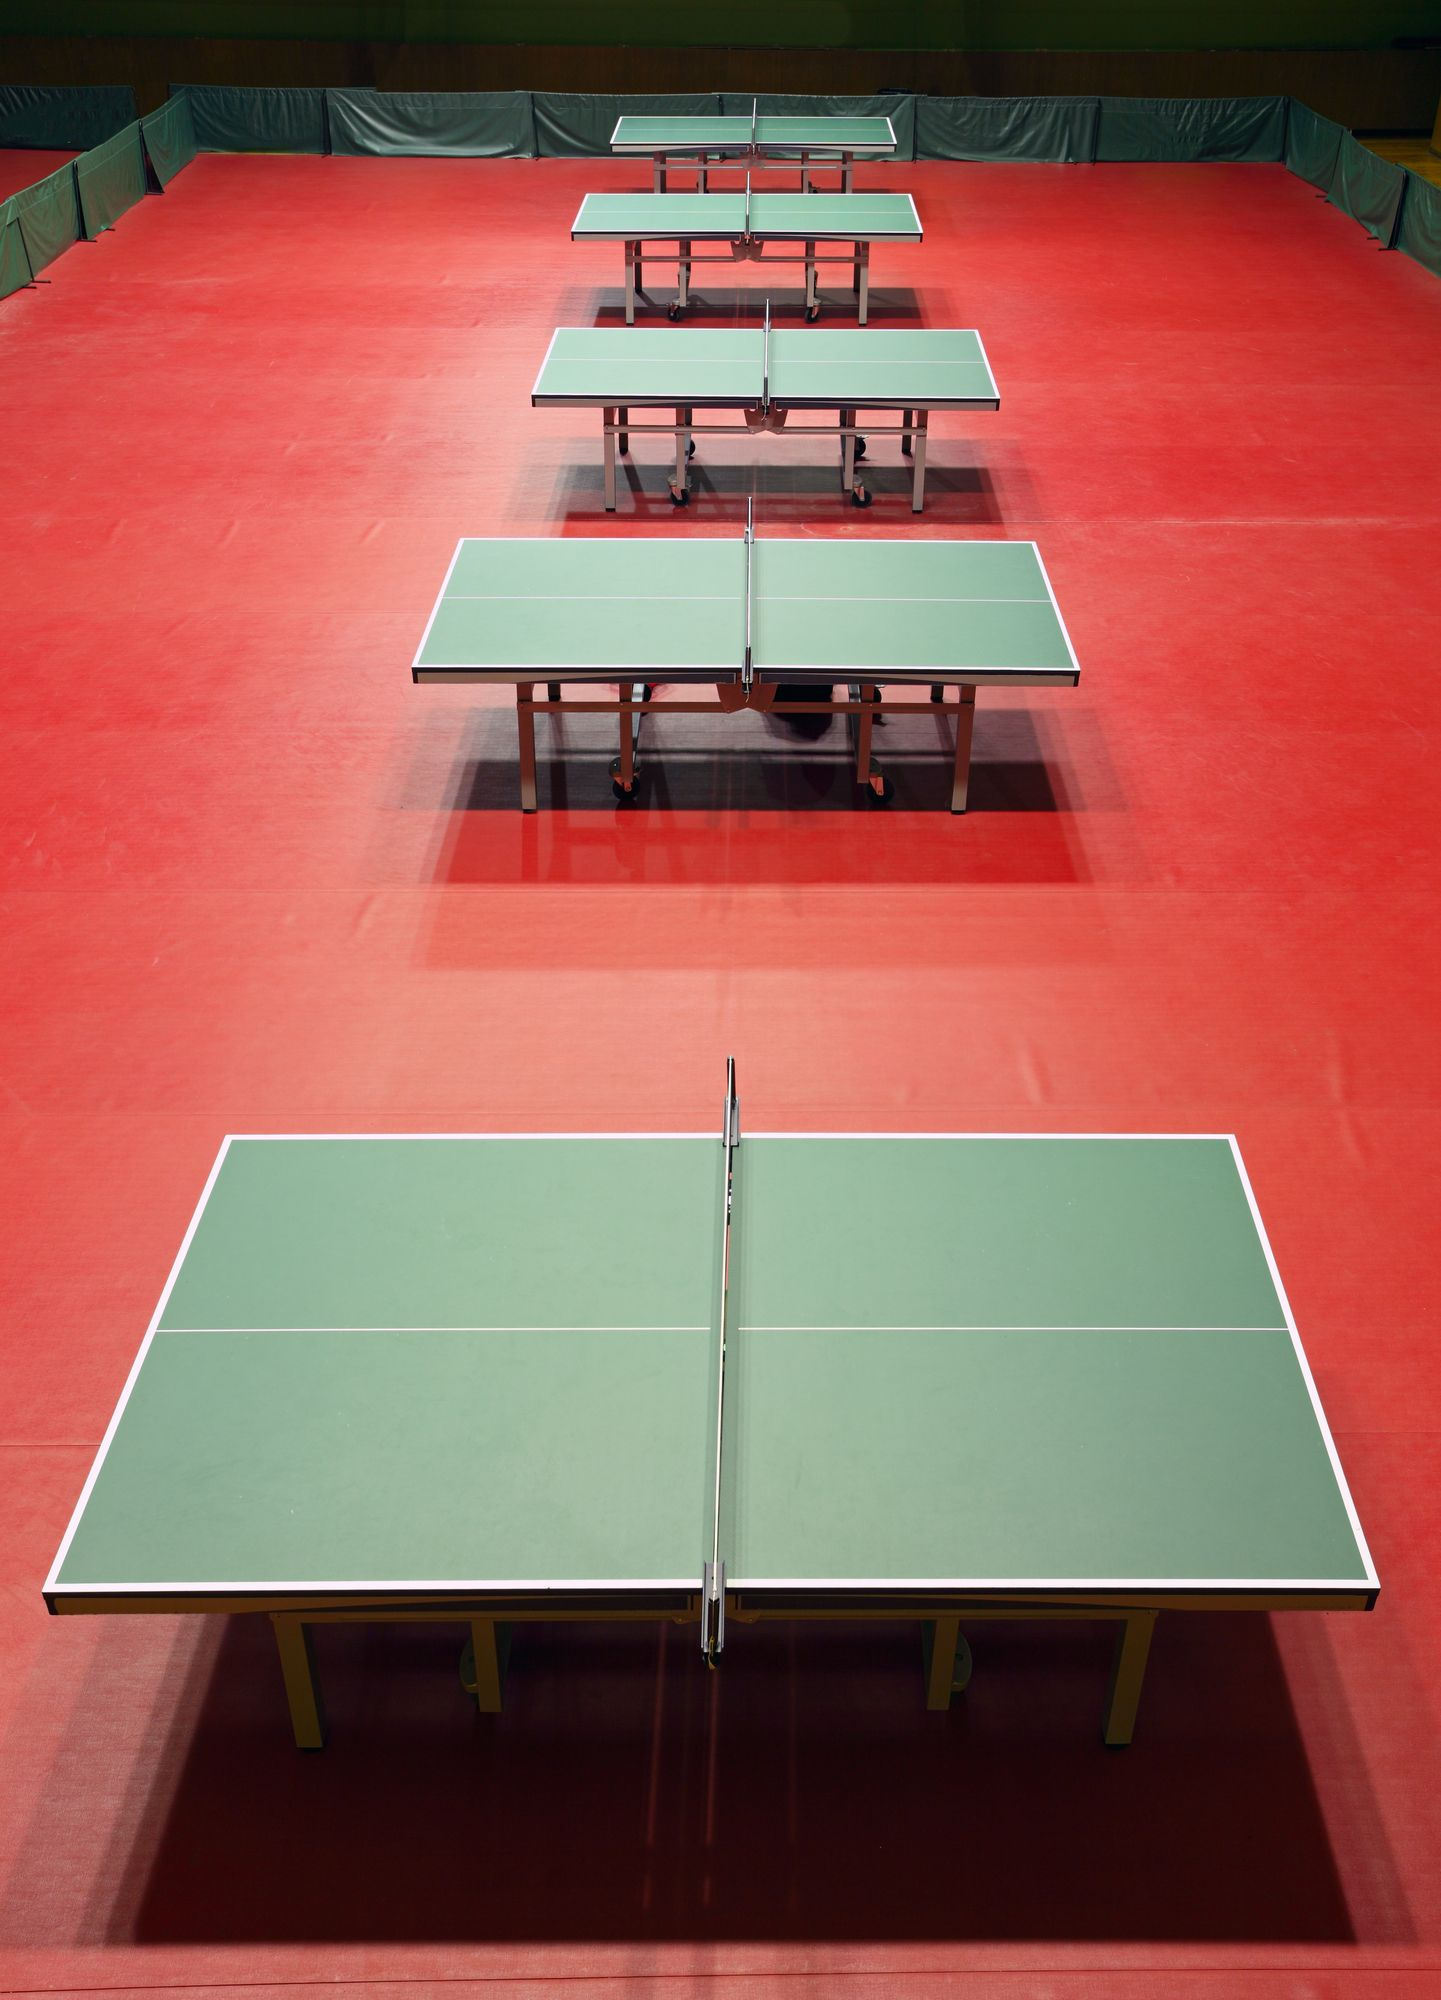 Table Tennis Venue Table Tennis Tennis Wallpaper Sport Hall